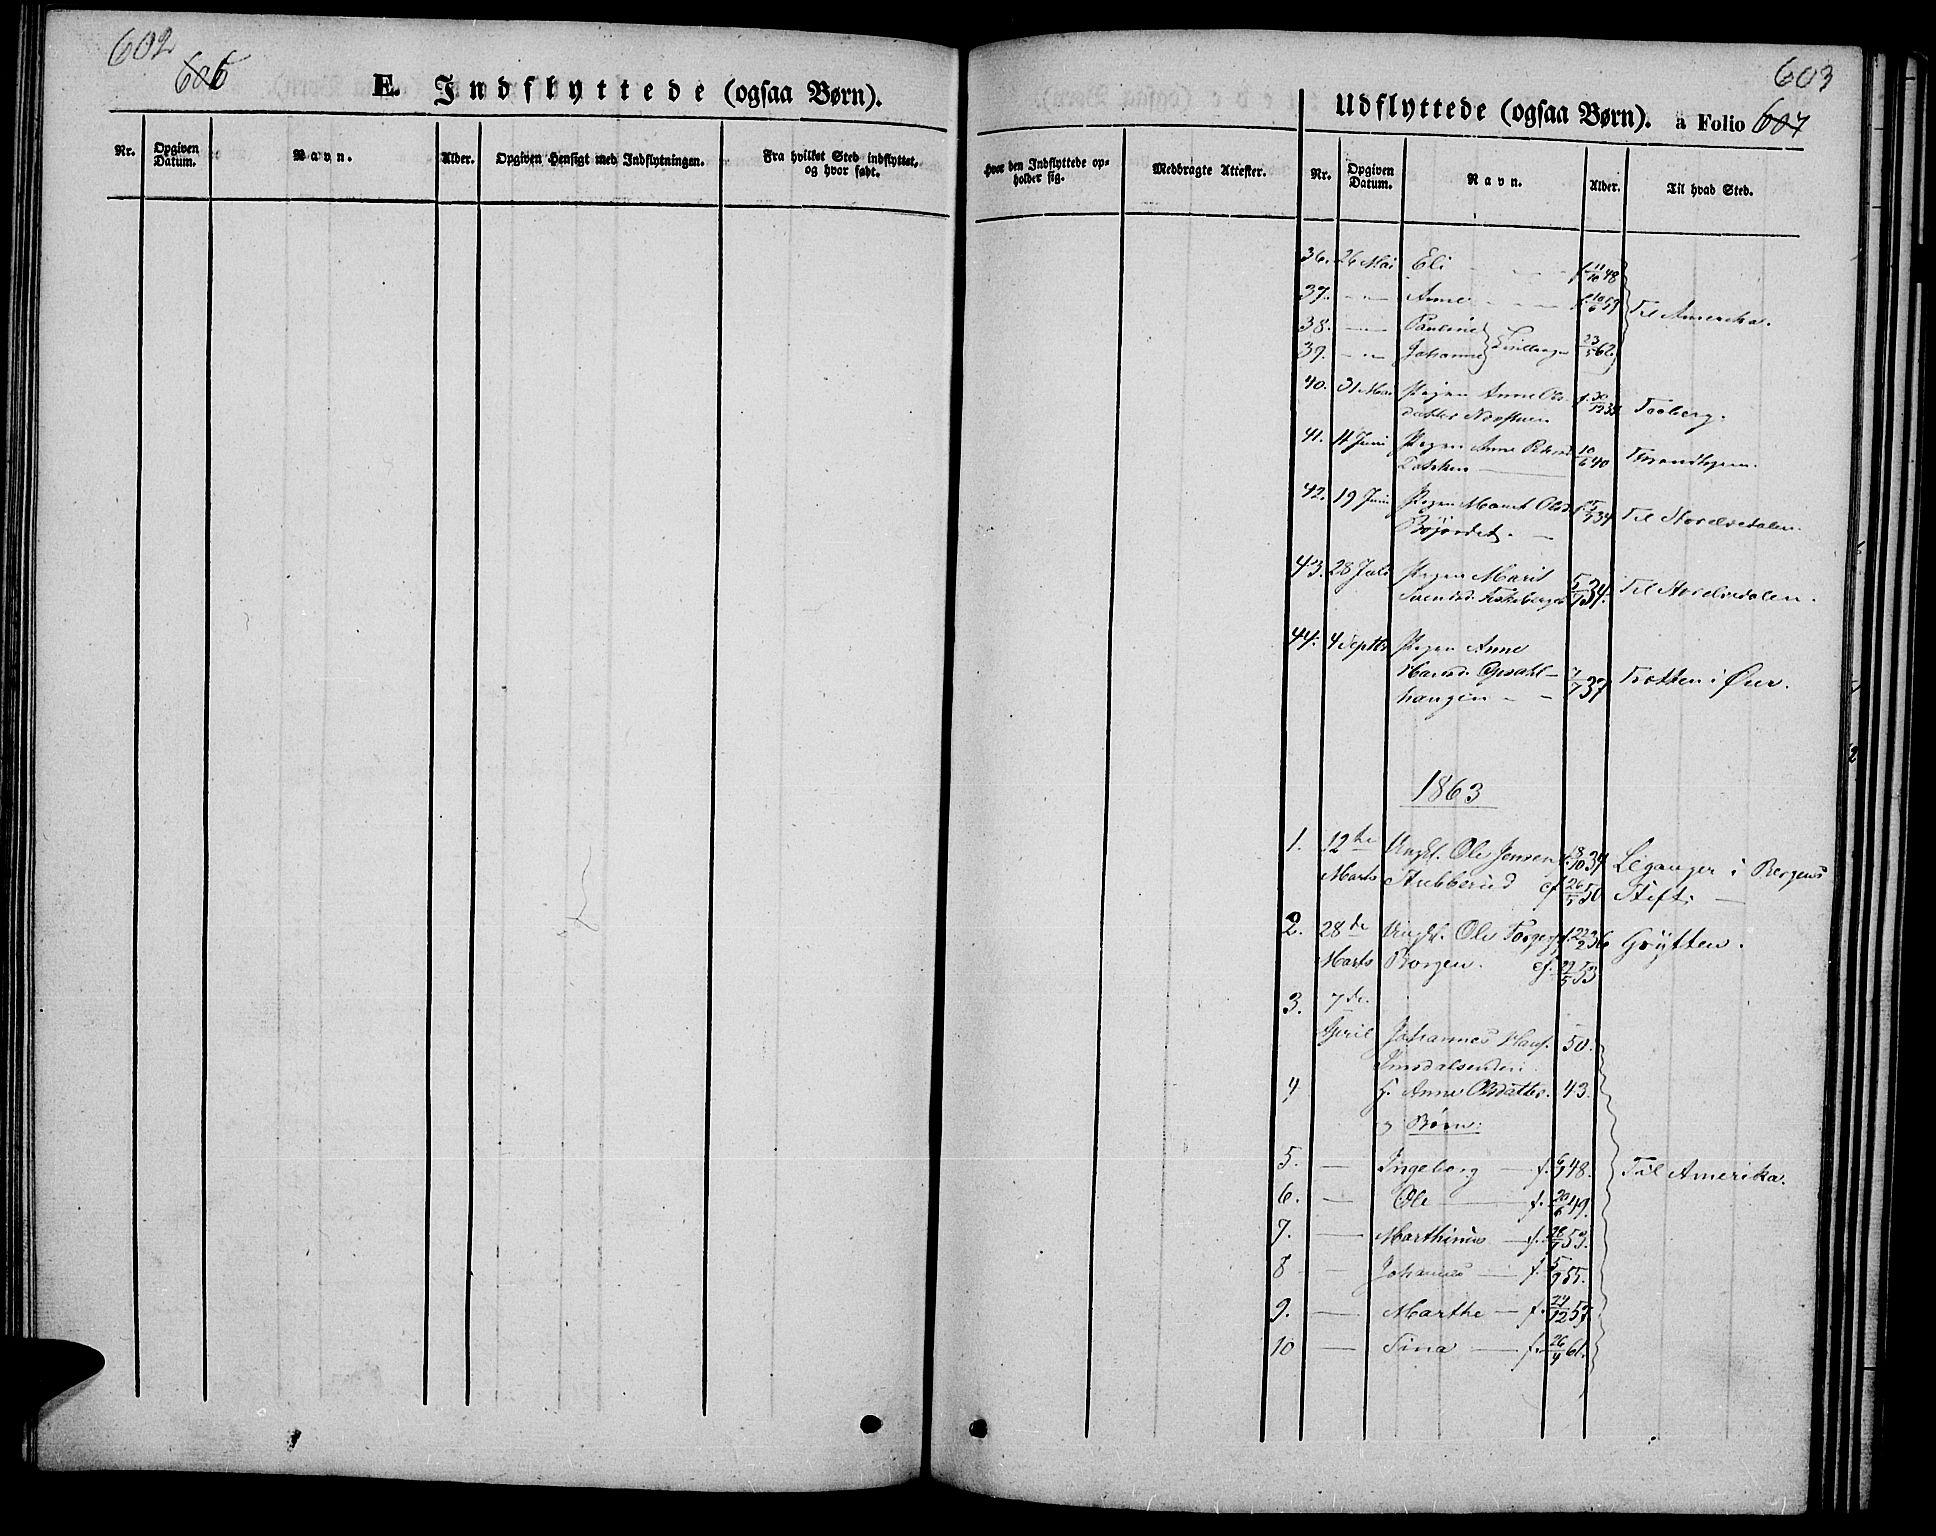 SAH, Ringebu prestekontor, Klokkerbok nr. 3, 1854-1866, s. 602-603